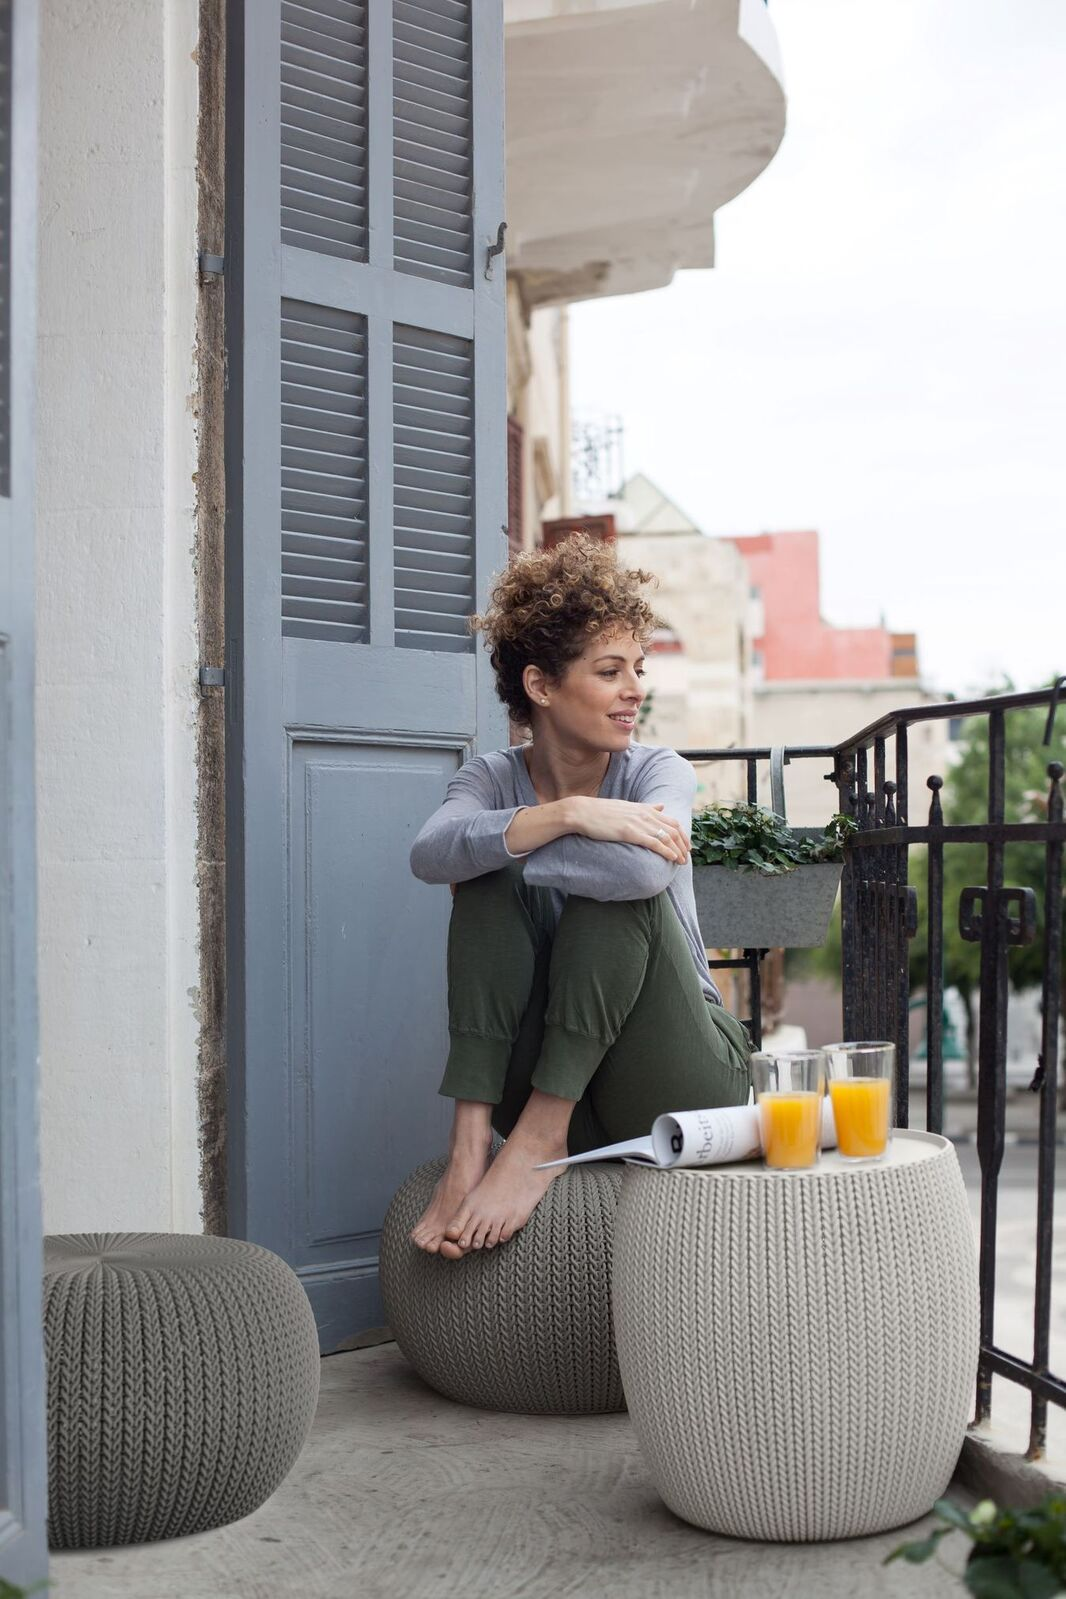 Keter Cozy Urban Furniture Balcony Set | Buy Outdoor ...